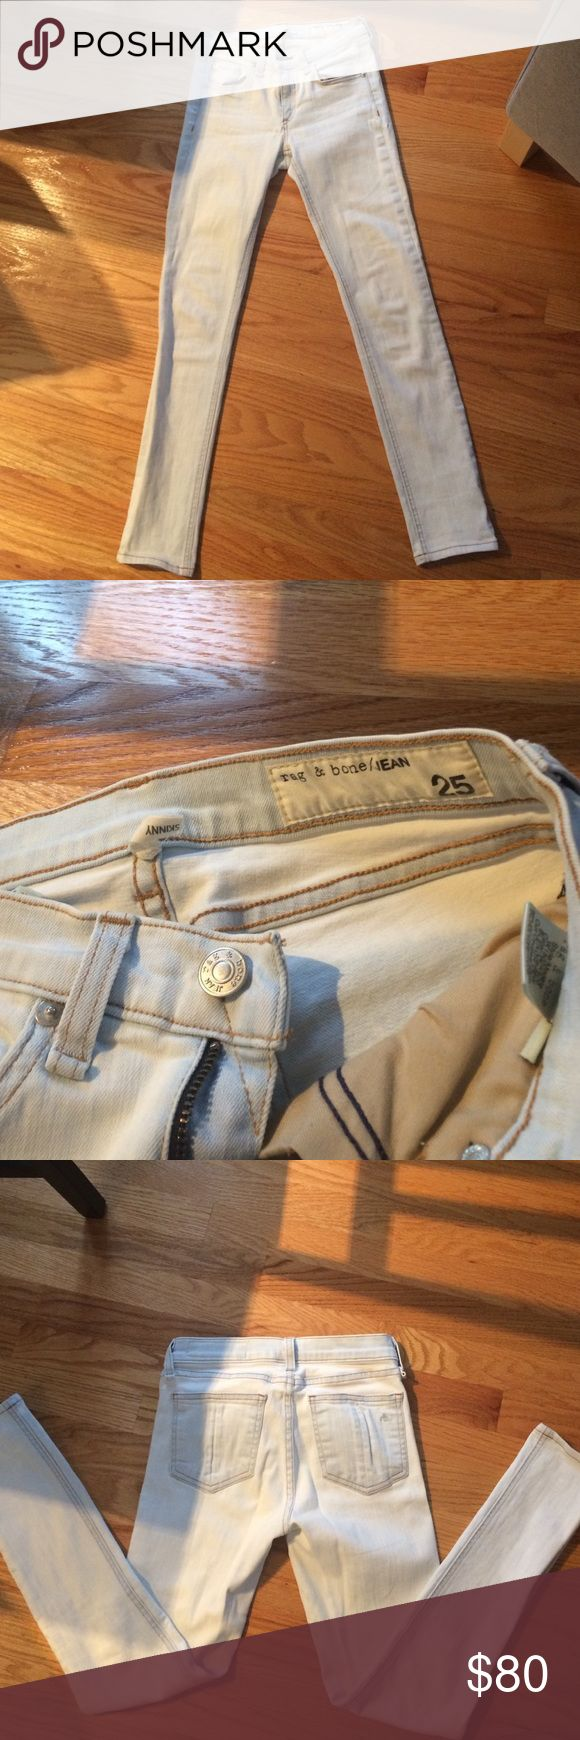 Rag & Bone bleach wash skinny jeans Super cute Rag & Bone bleach wash jeans. Skinny fit and stretchy.  Spring/summer staple! rag & bone Jeans Skinny